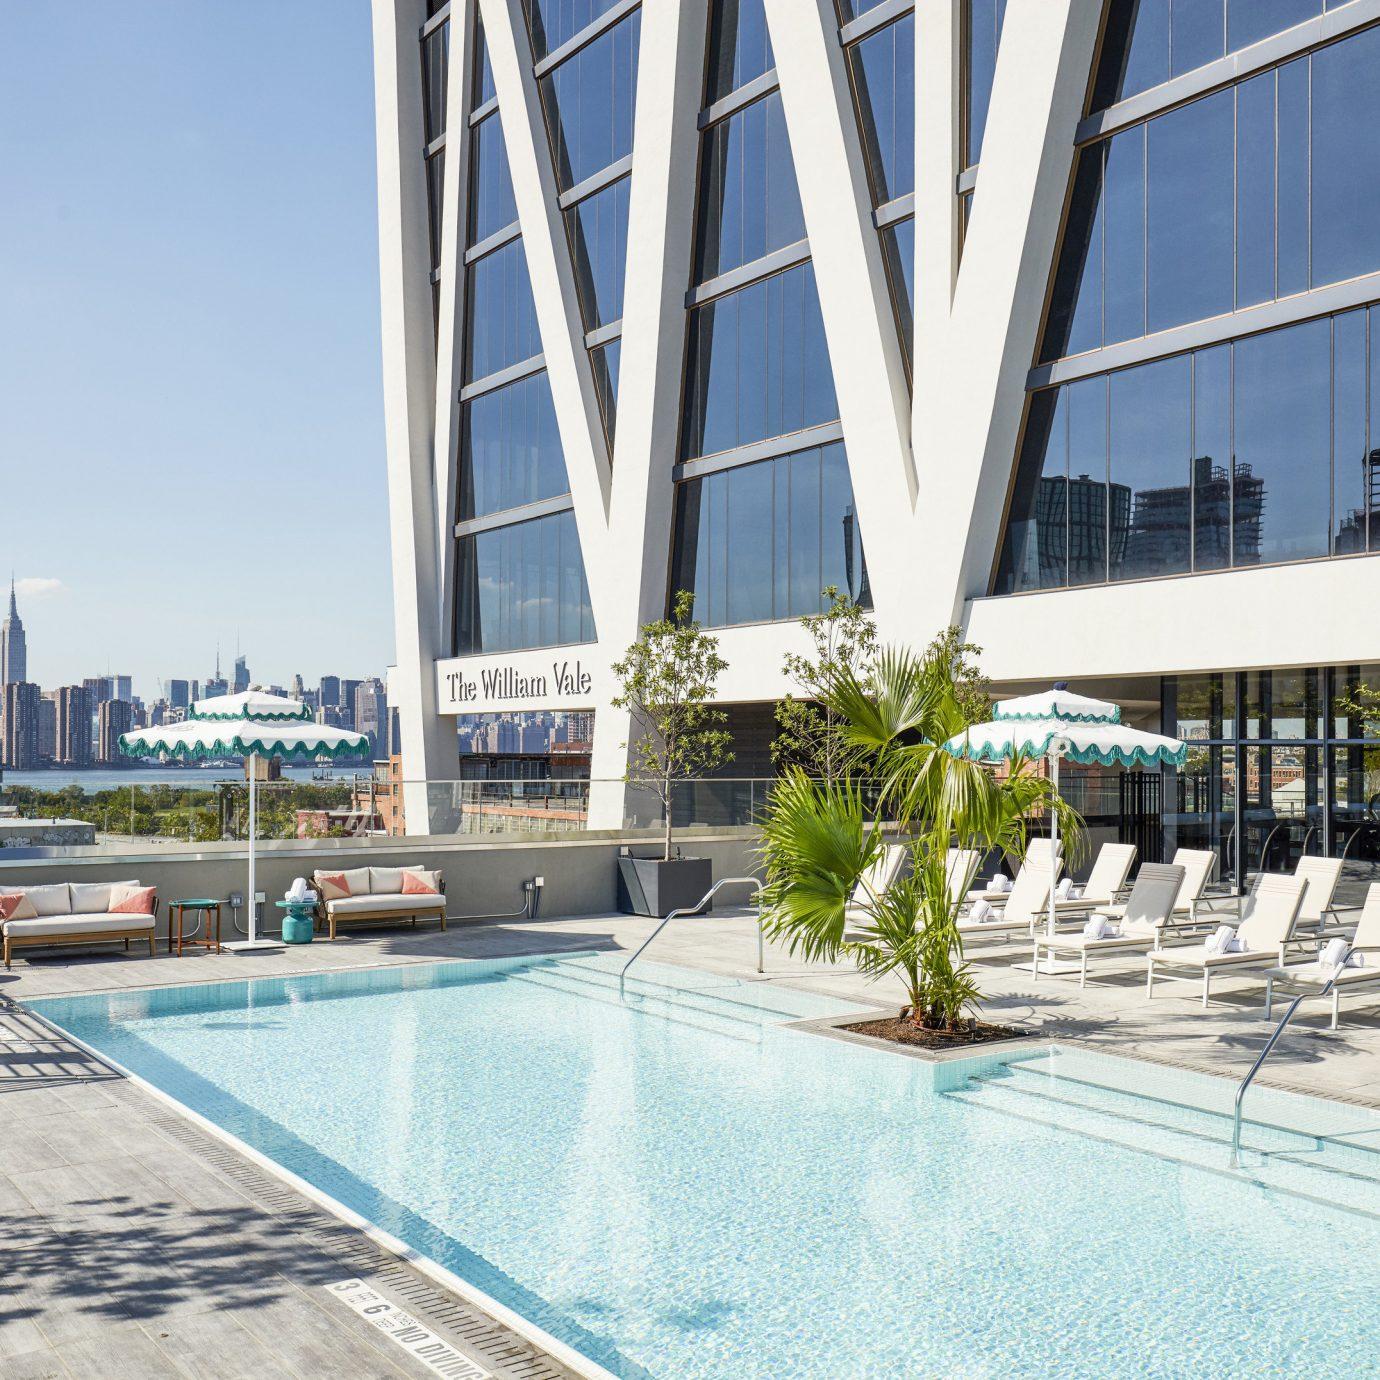 sky building leisure property condominium swimming pool plaza Architecture Resort headquarters